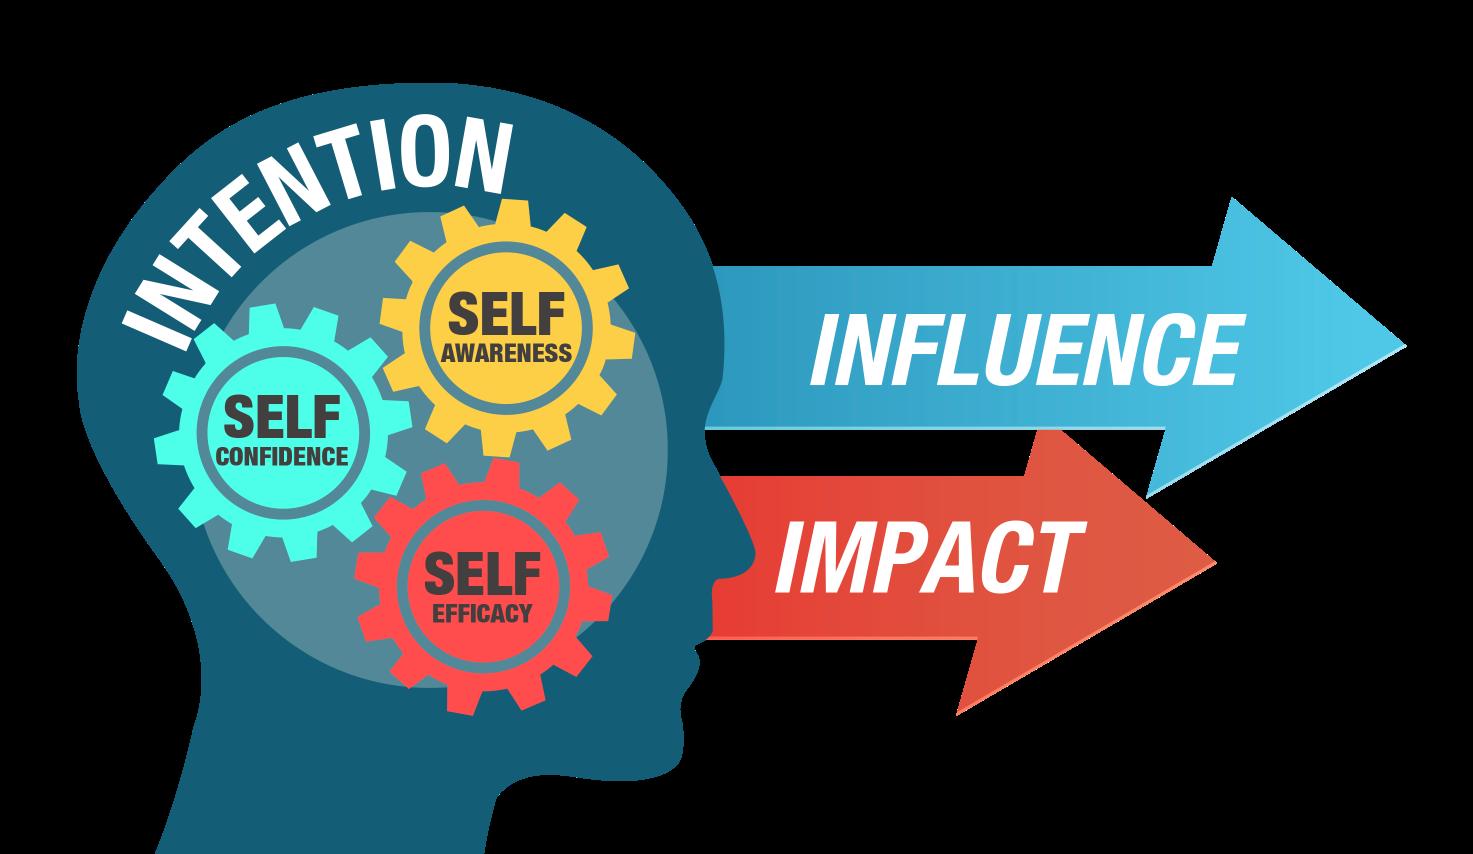 Self-leadership model by Andrew Bryant Copyright 2016